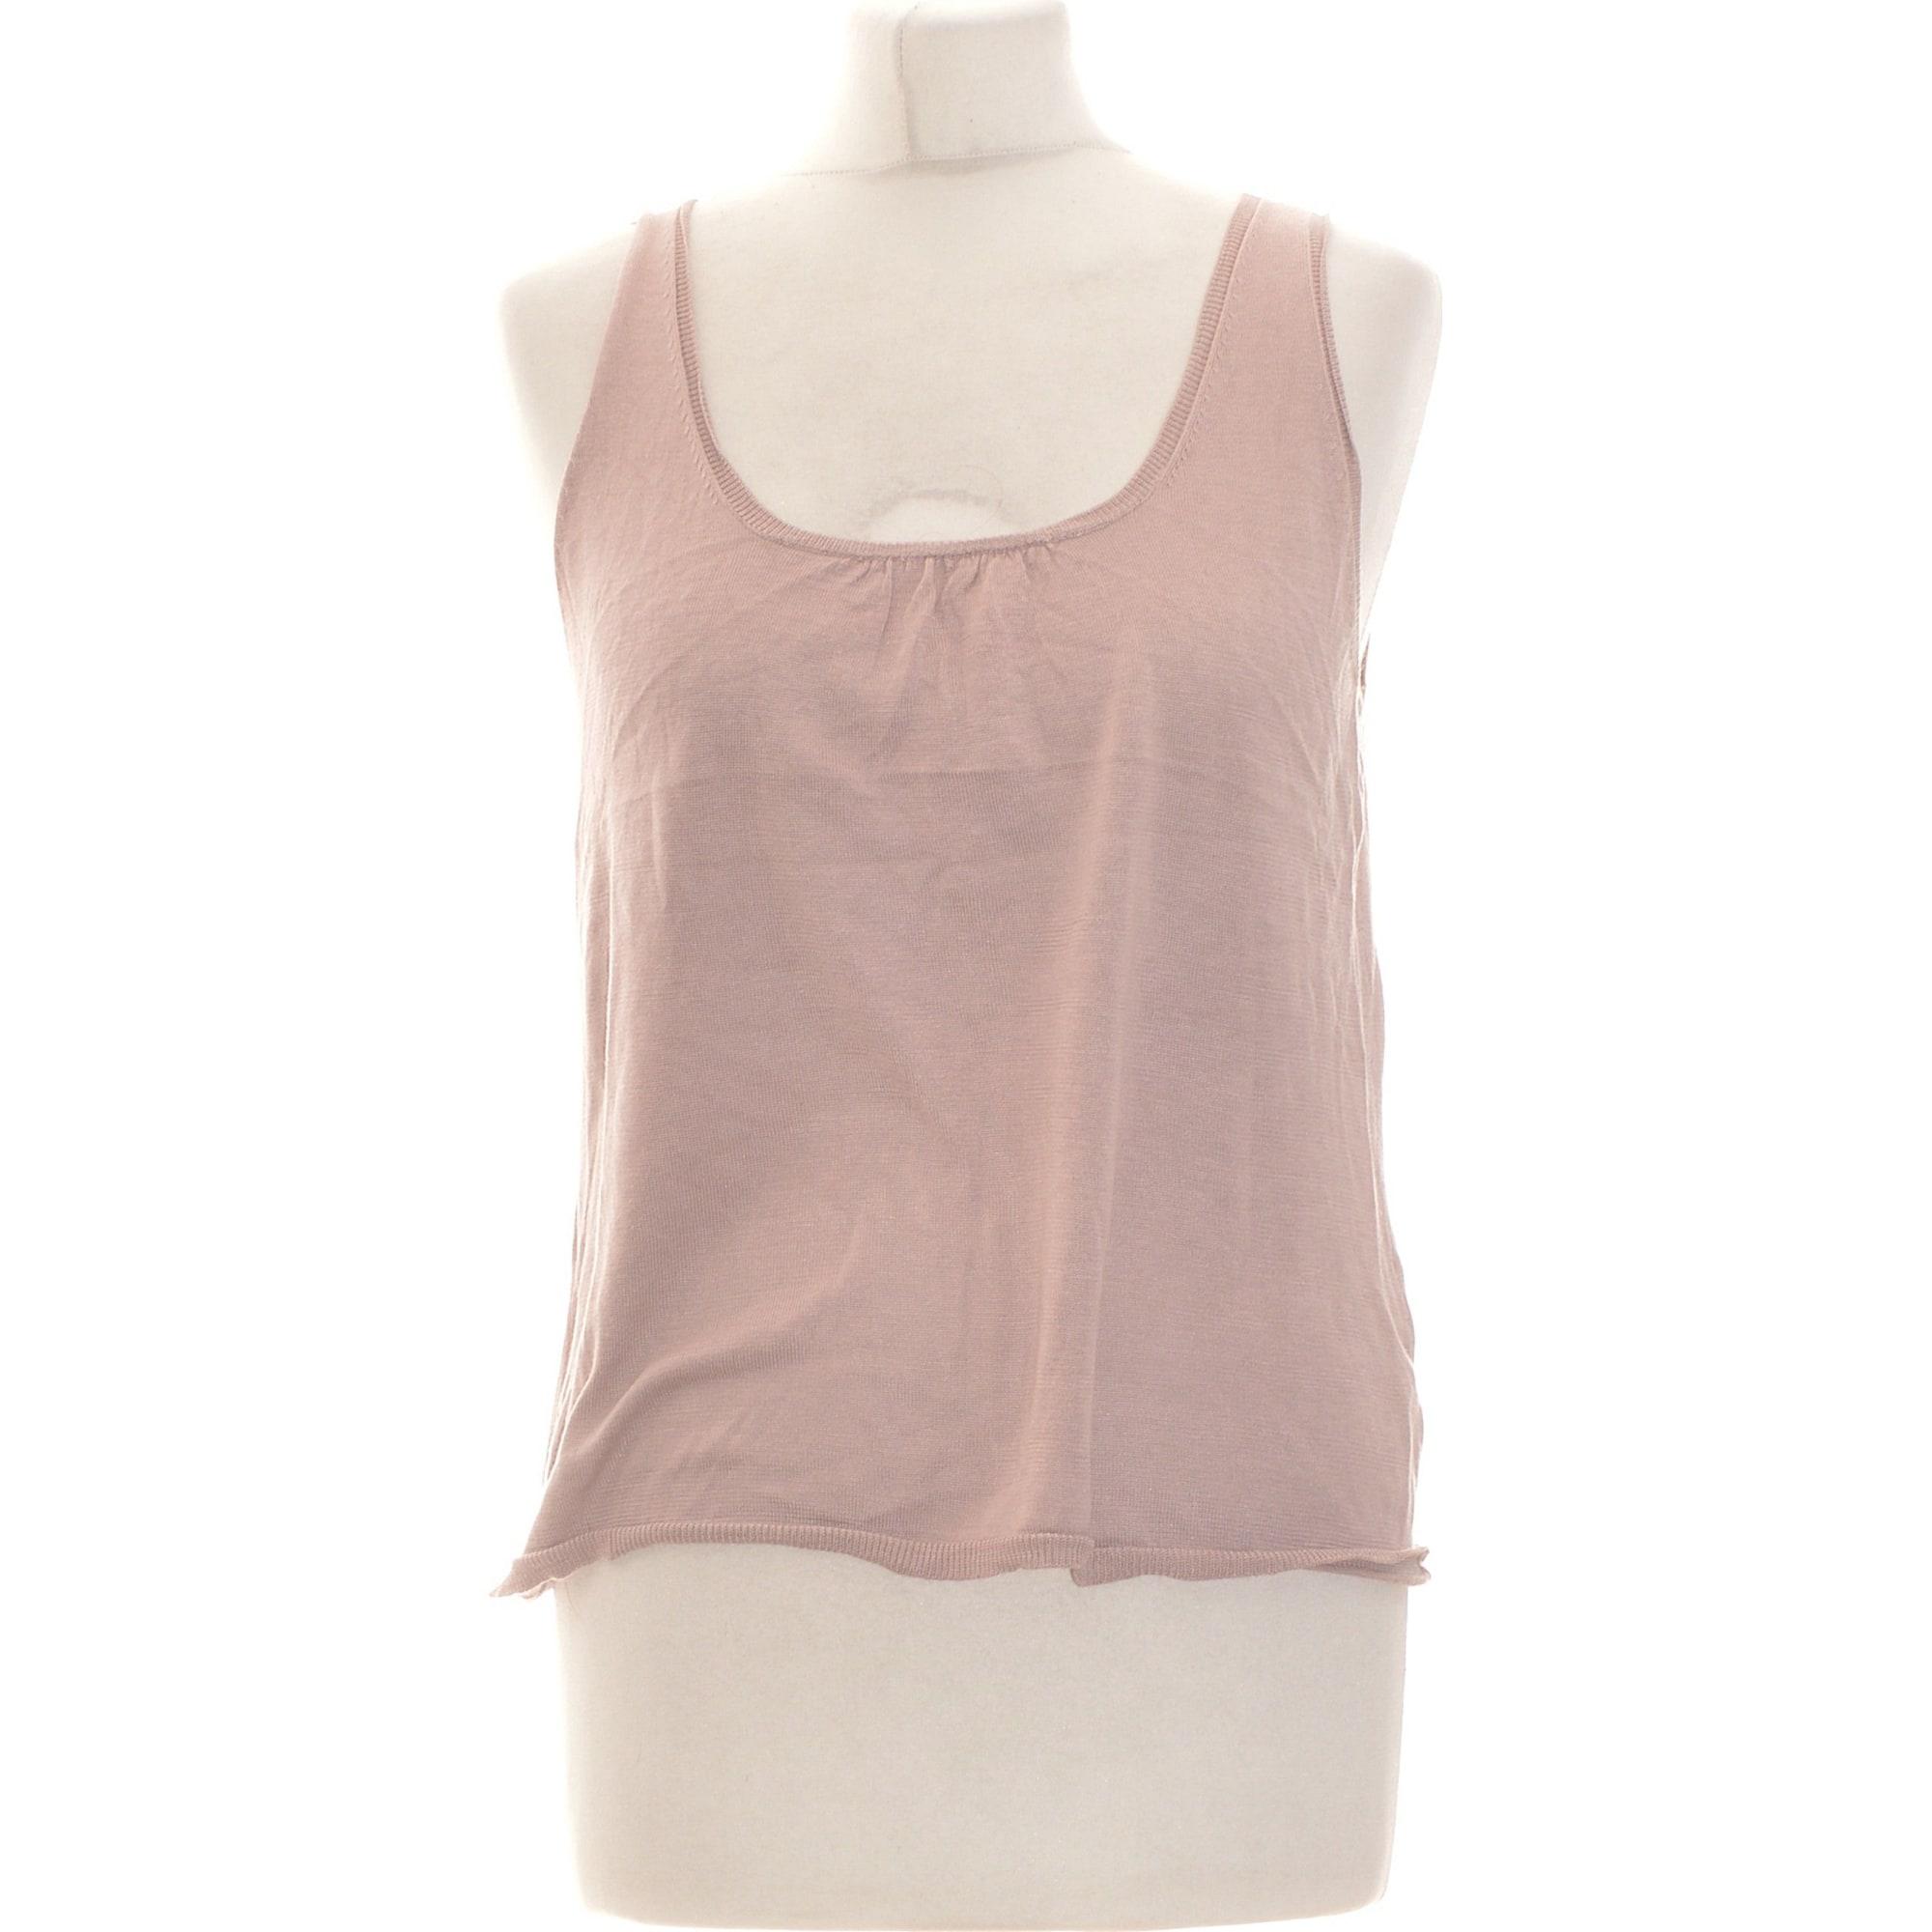 Tank Top ALAIN MANOUKIAN Pink, fuchsia, light pink